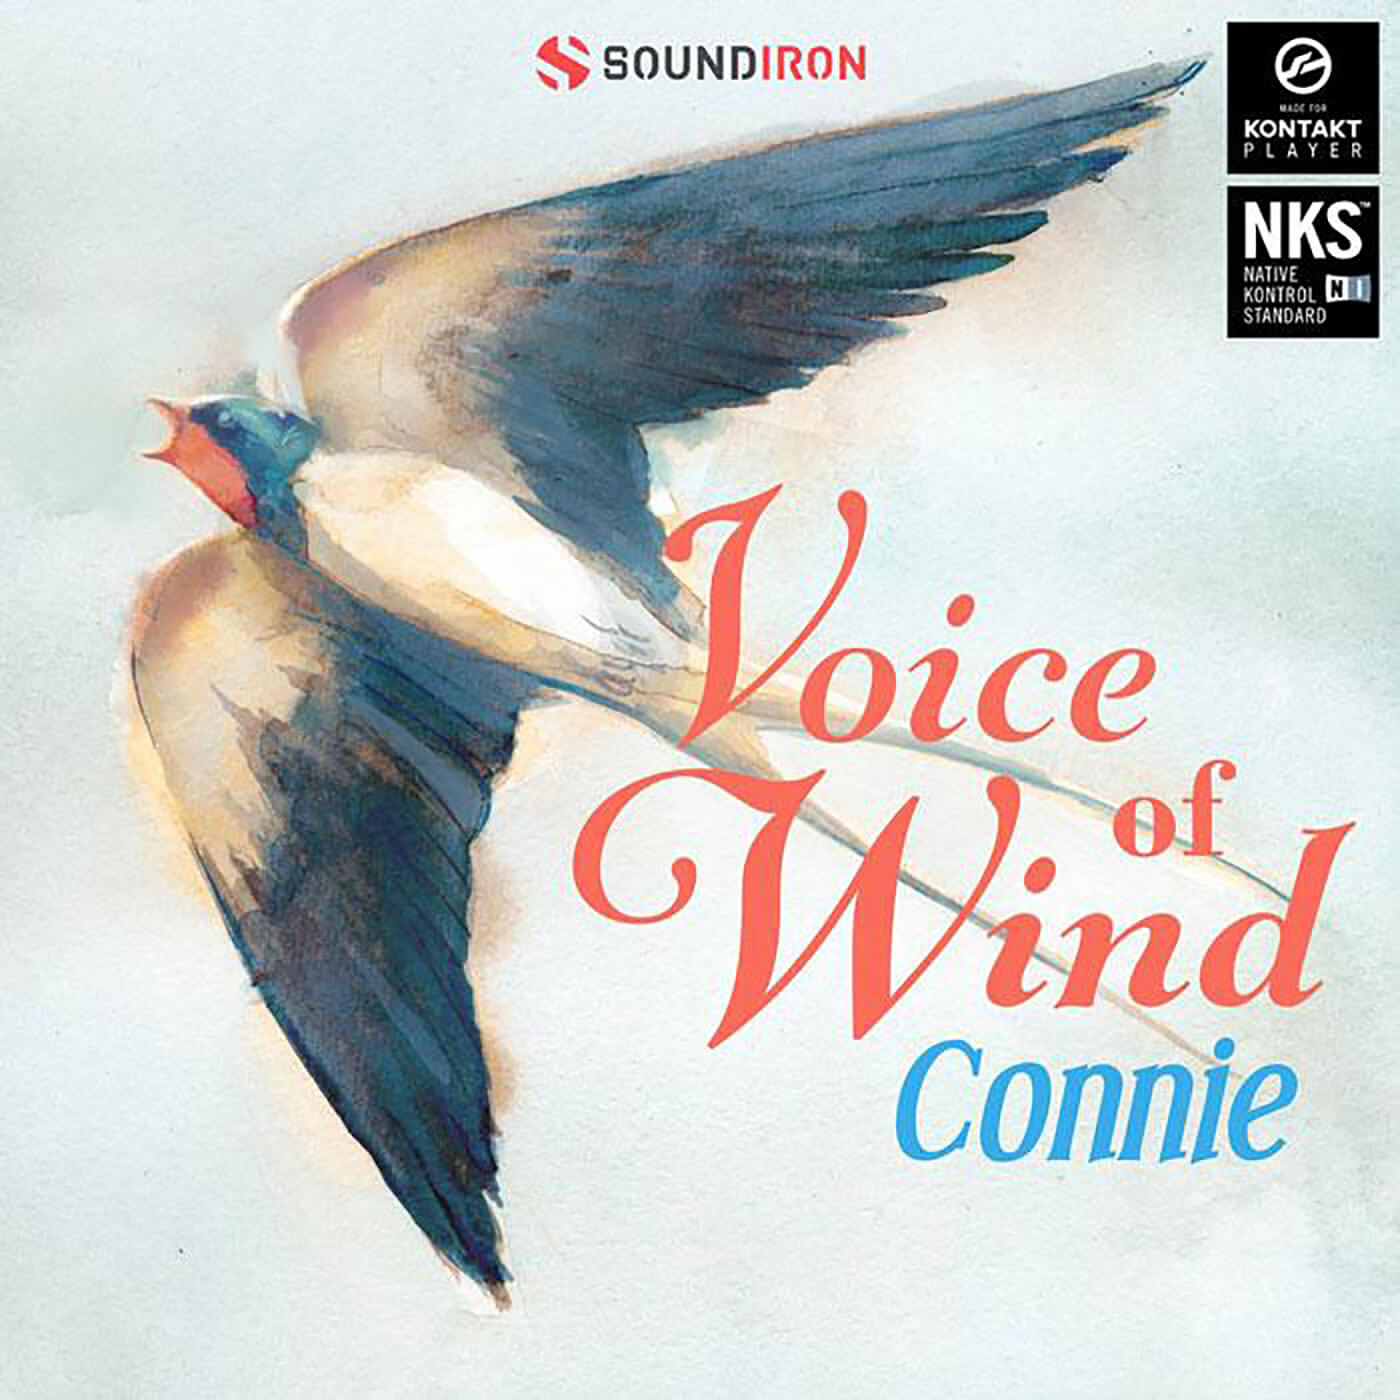 Soundiron - Voice of Wind: Connie